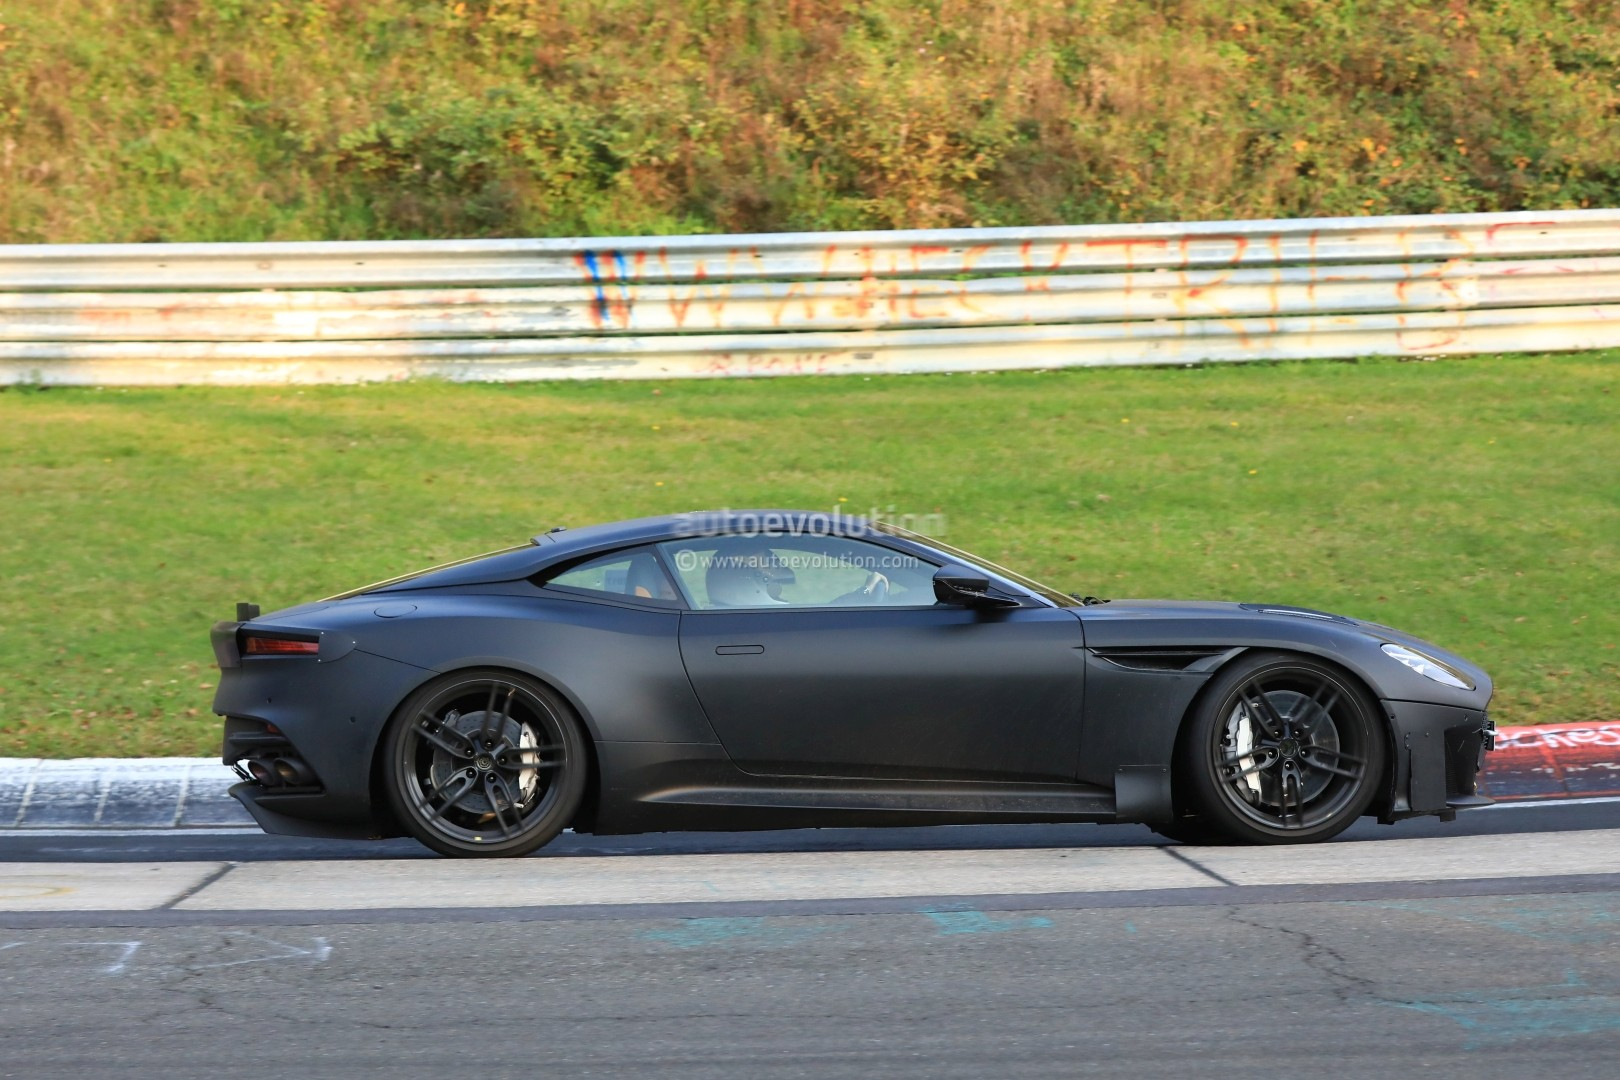 2019 Aston Martin Vanquish Spied On Nurburgring Hybridisation